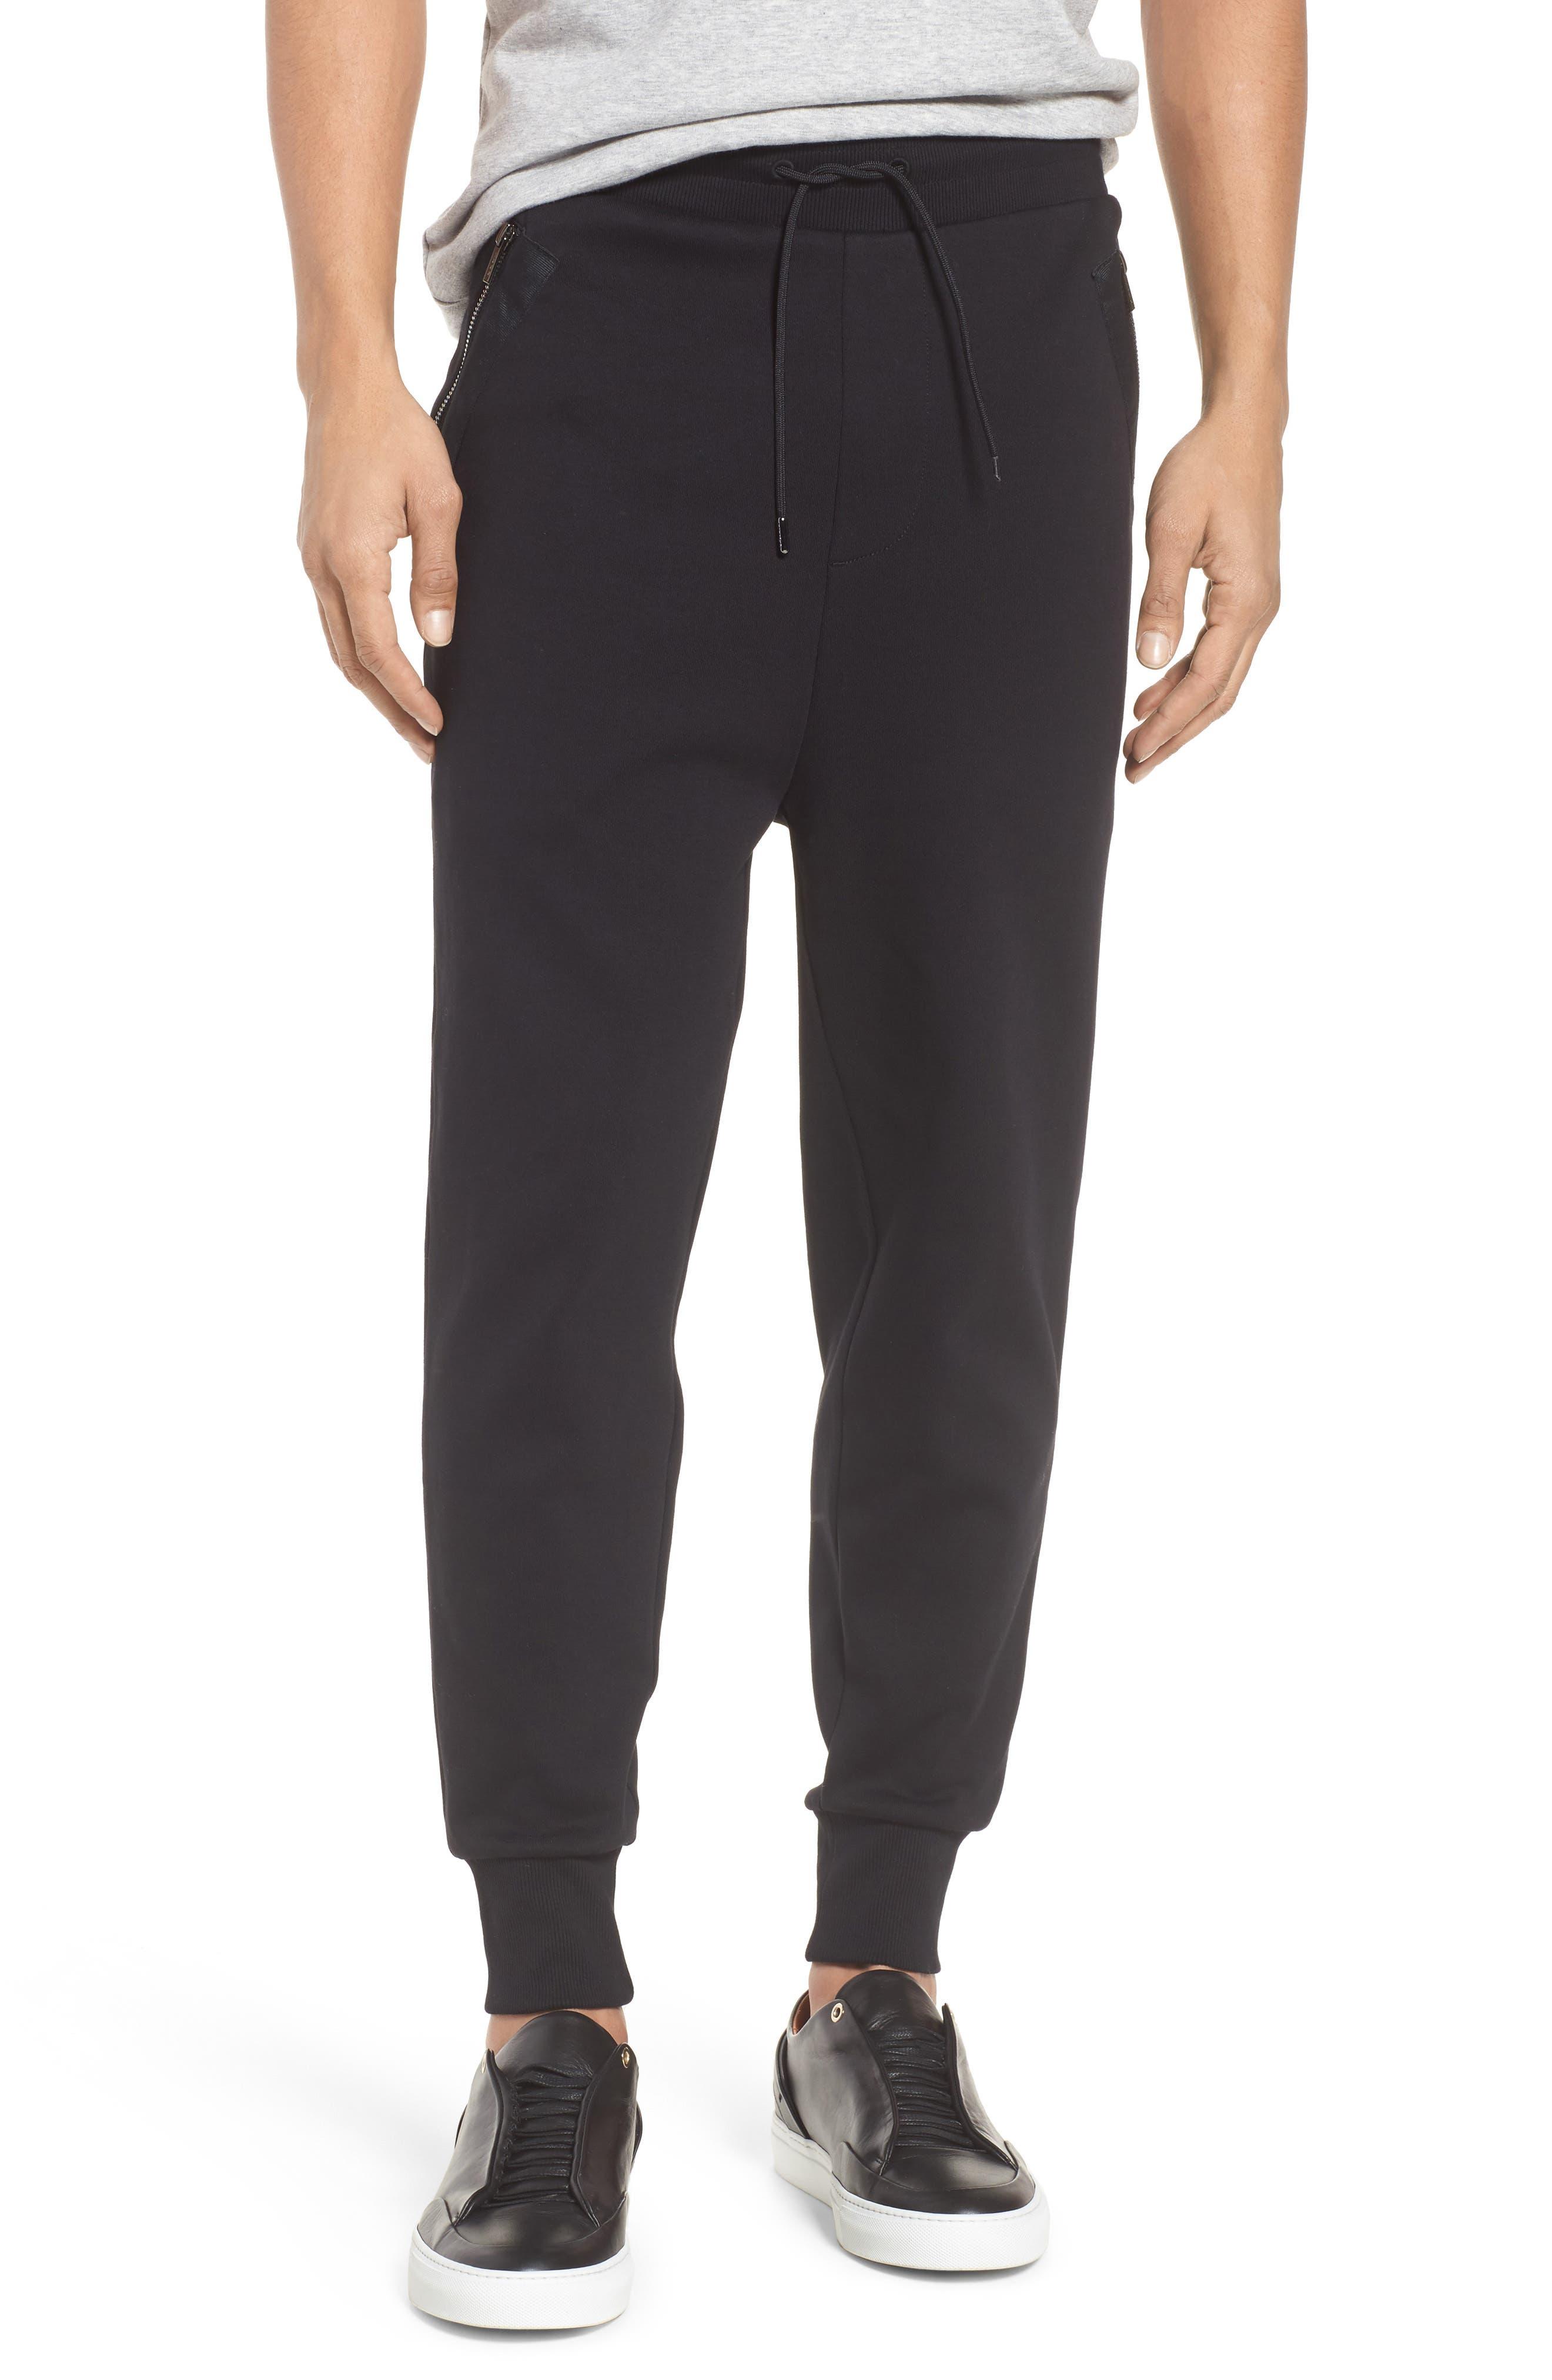 Daring Relaxed Fit Sweatpants,                         Main,                         color, Black